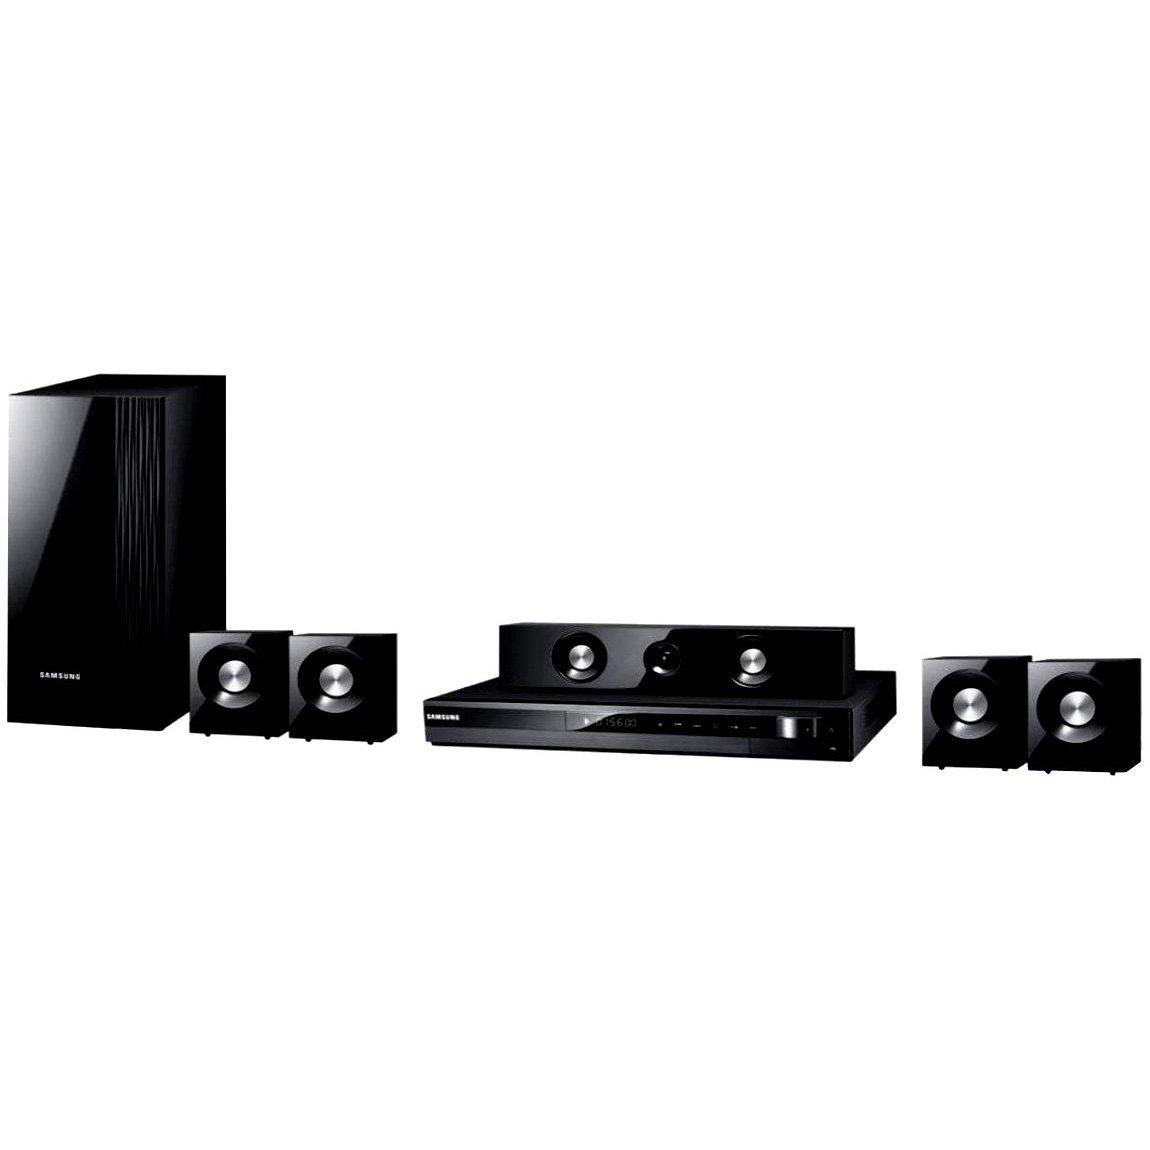 samsung ht c350 5 1 dvd home cinema surround system ebay lg plasma tv manual download lg plasma tv 42pc5d manual